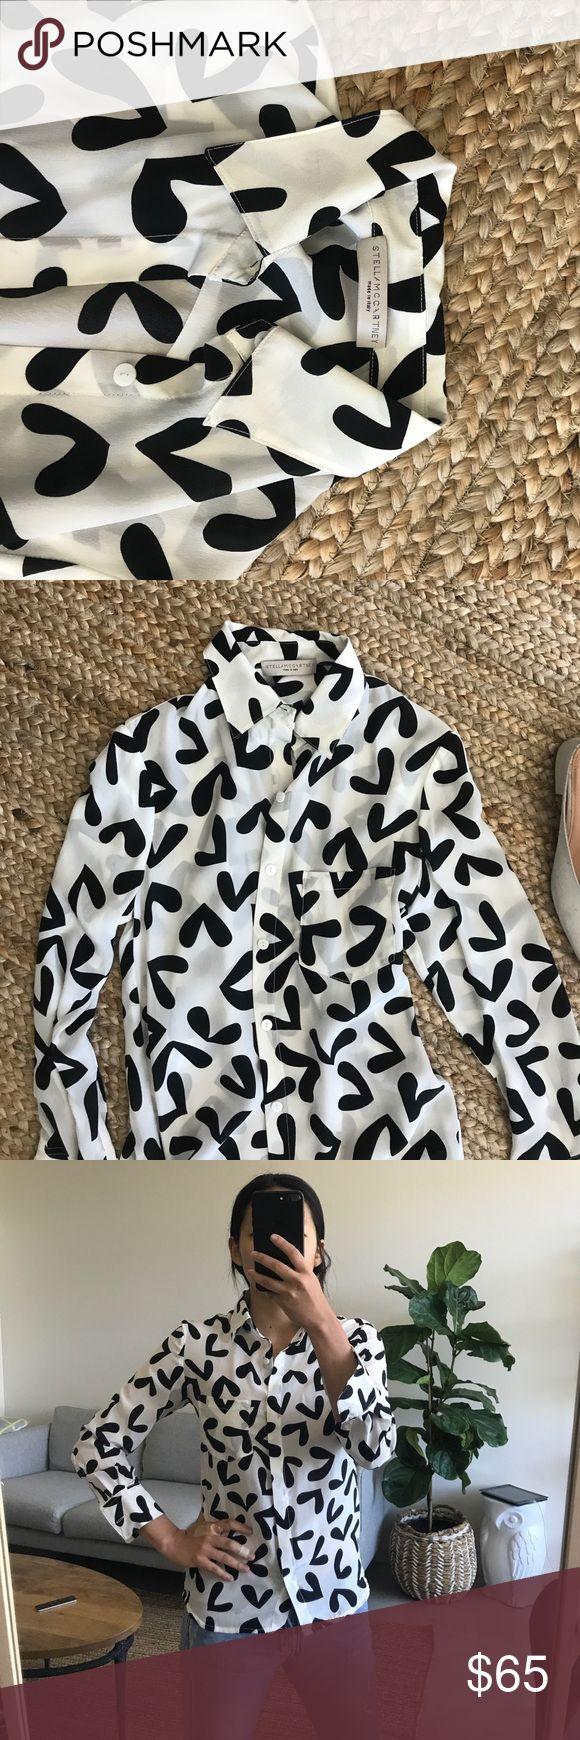 Stella mccartney heart print shirt blouse Stella mccartney print blouse shirt - usually wear a size small - bought at a sample sale Stella McCartney Tops Button Down Shirts